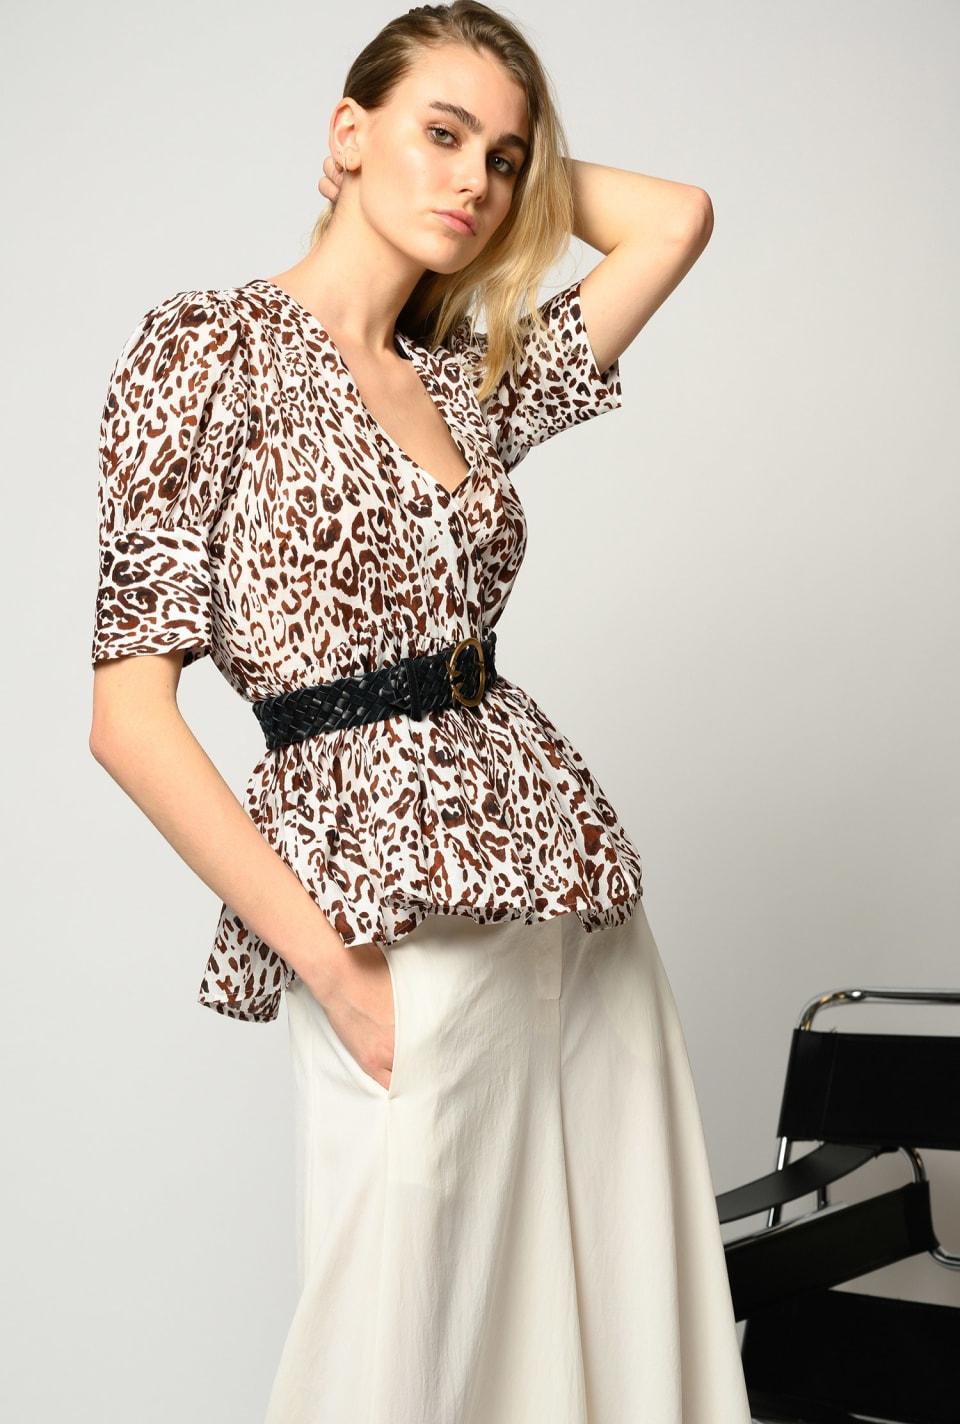 Blouse in leopard-print ramie - Pinko